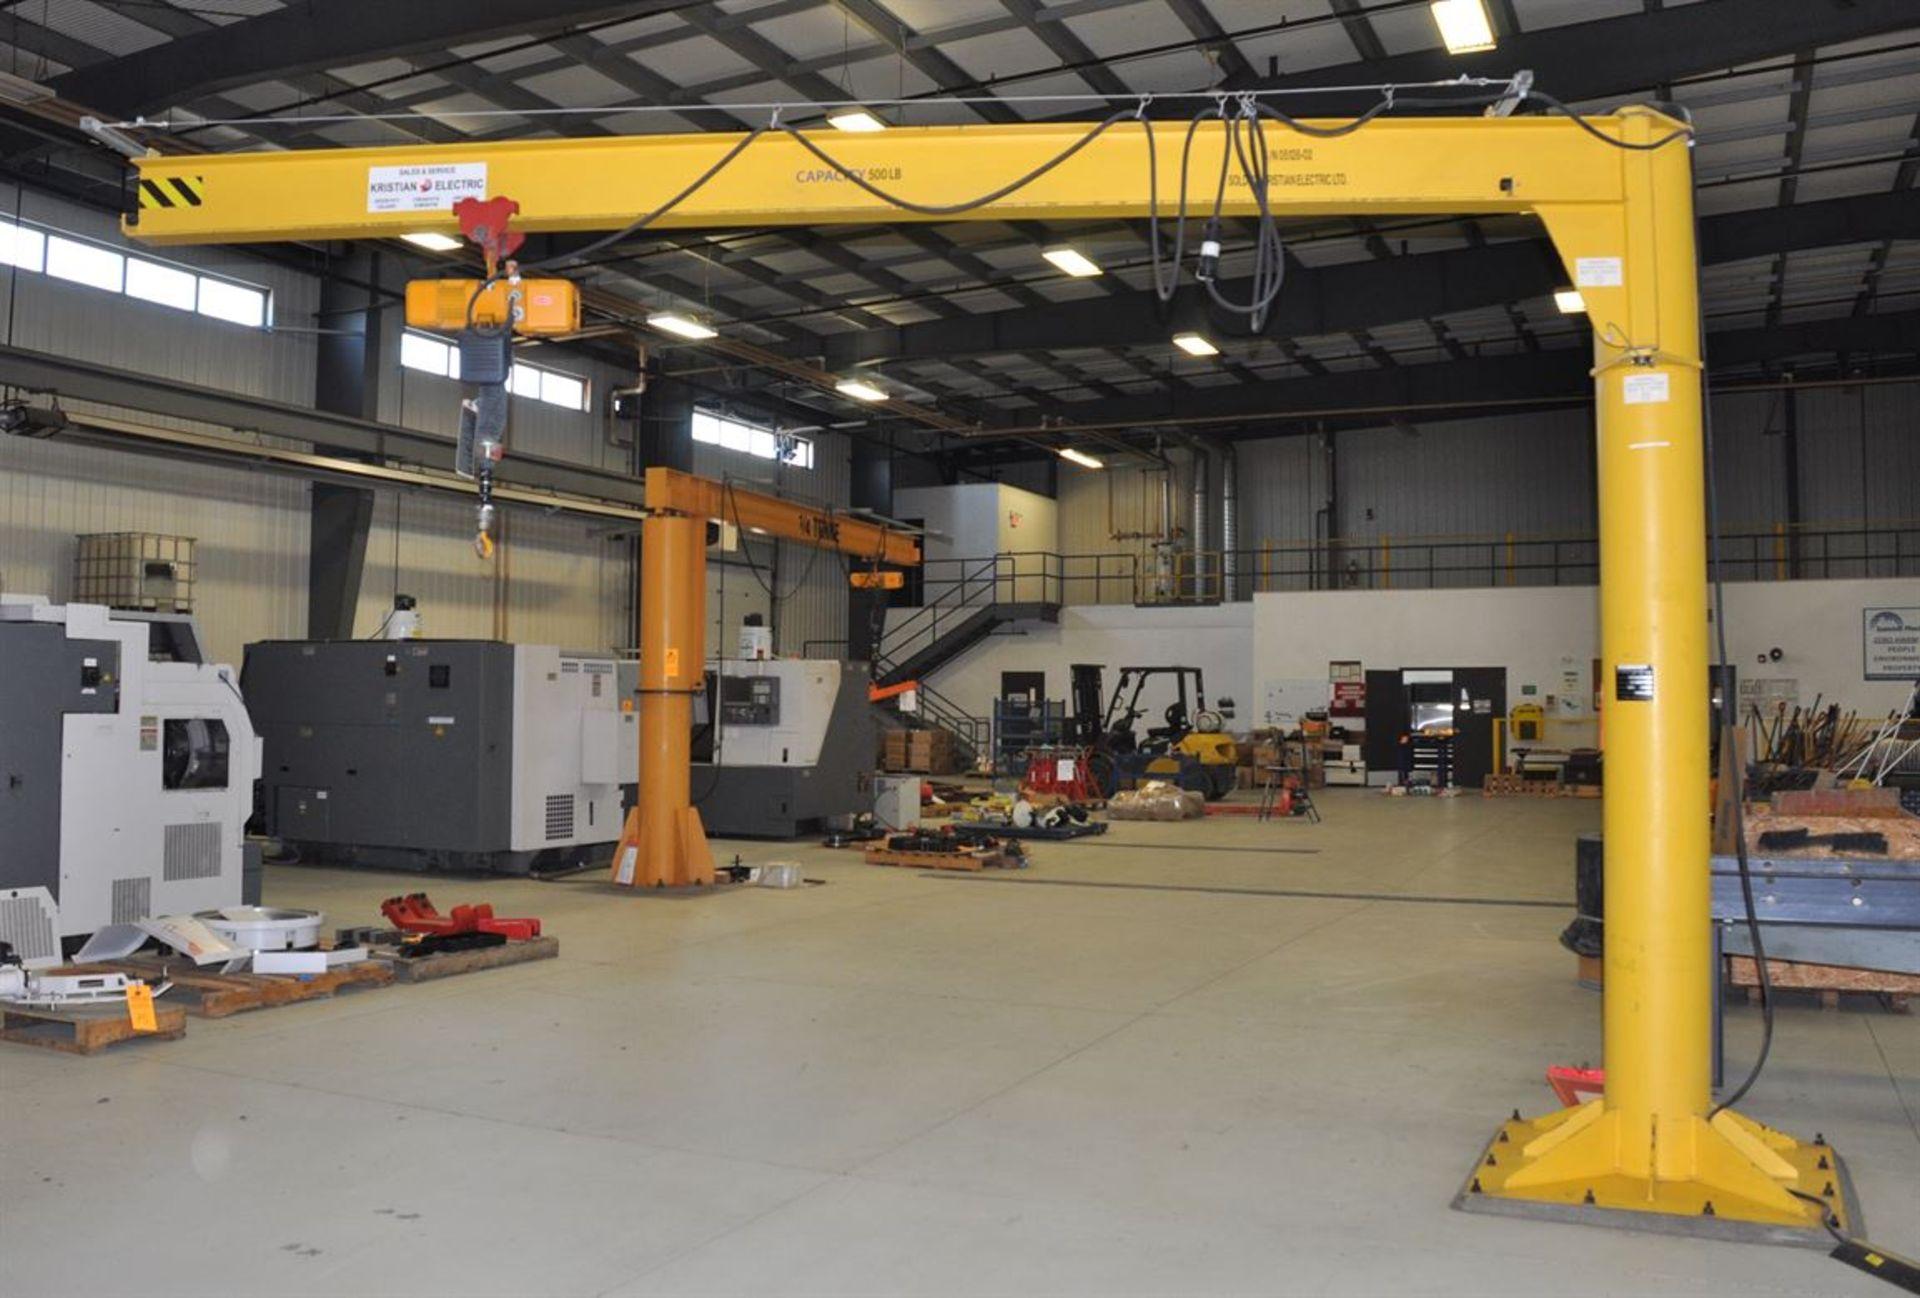 O'BRIEN 500 lb Free Standing Jib Crane, w/ KITO 250 Electric Chain Hoist - Image 2 of 2